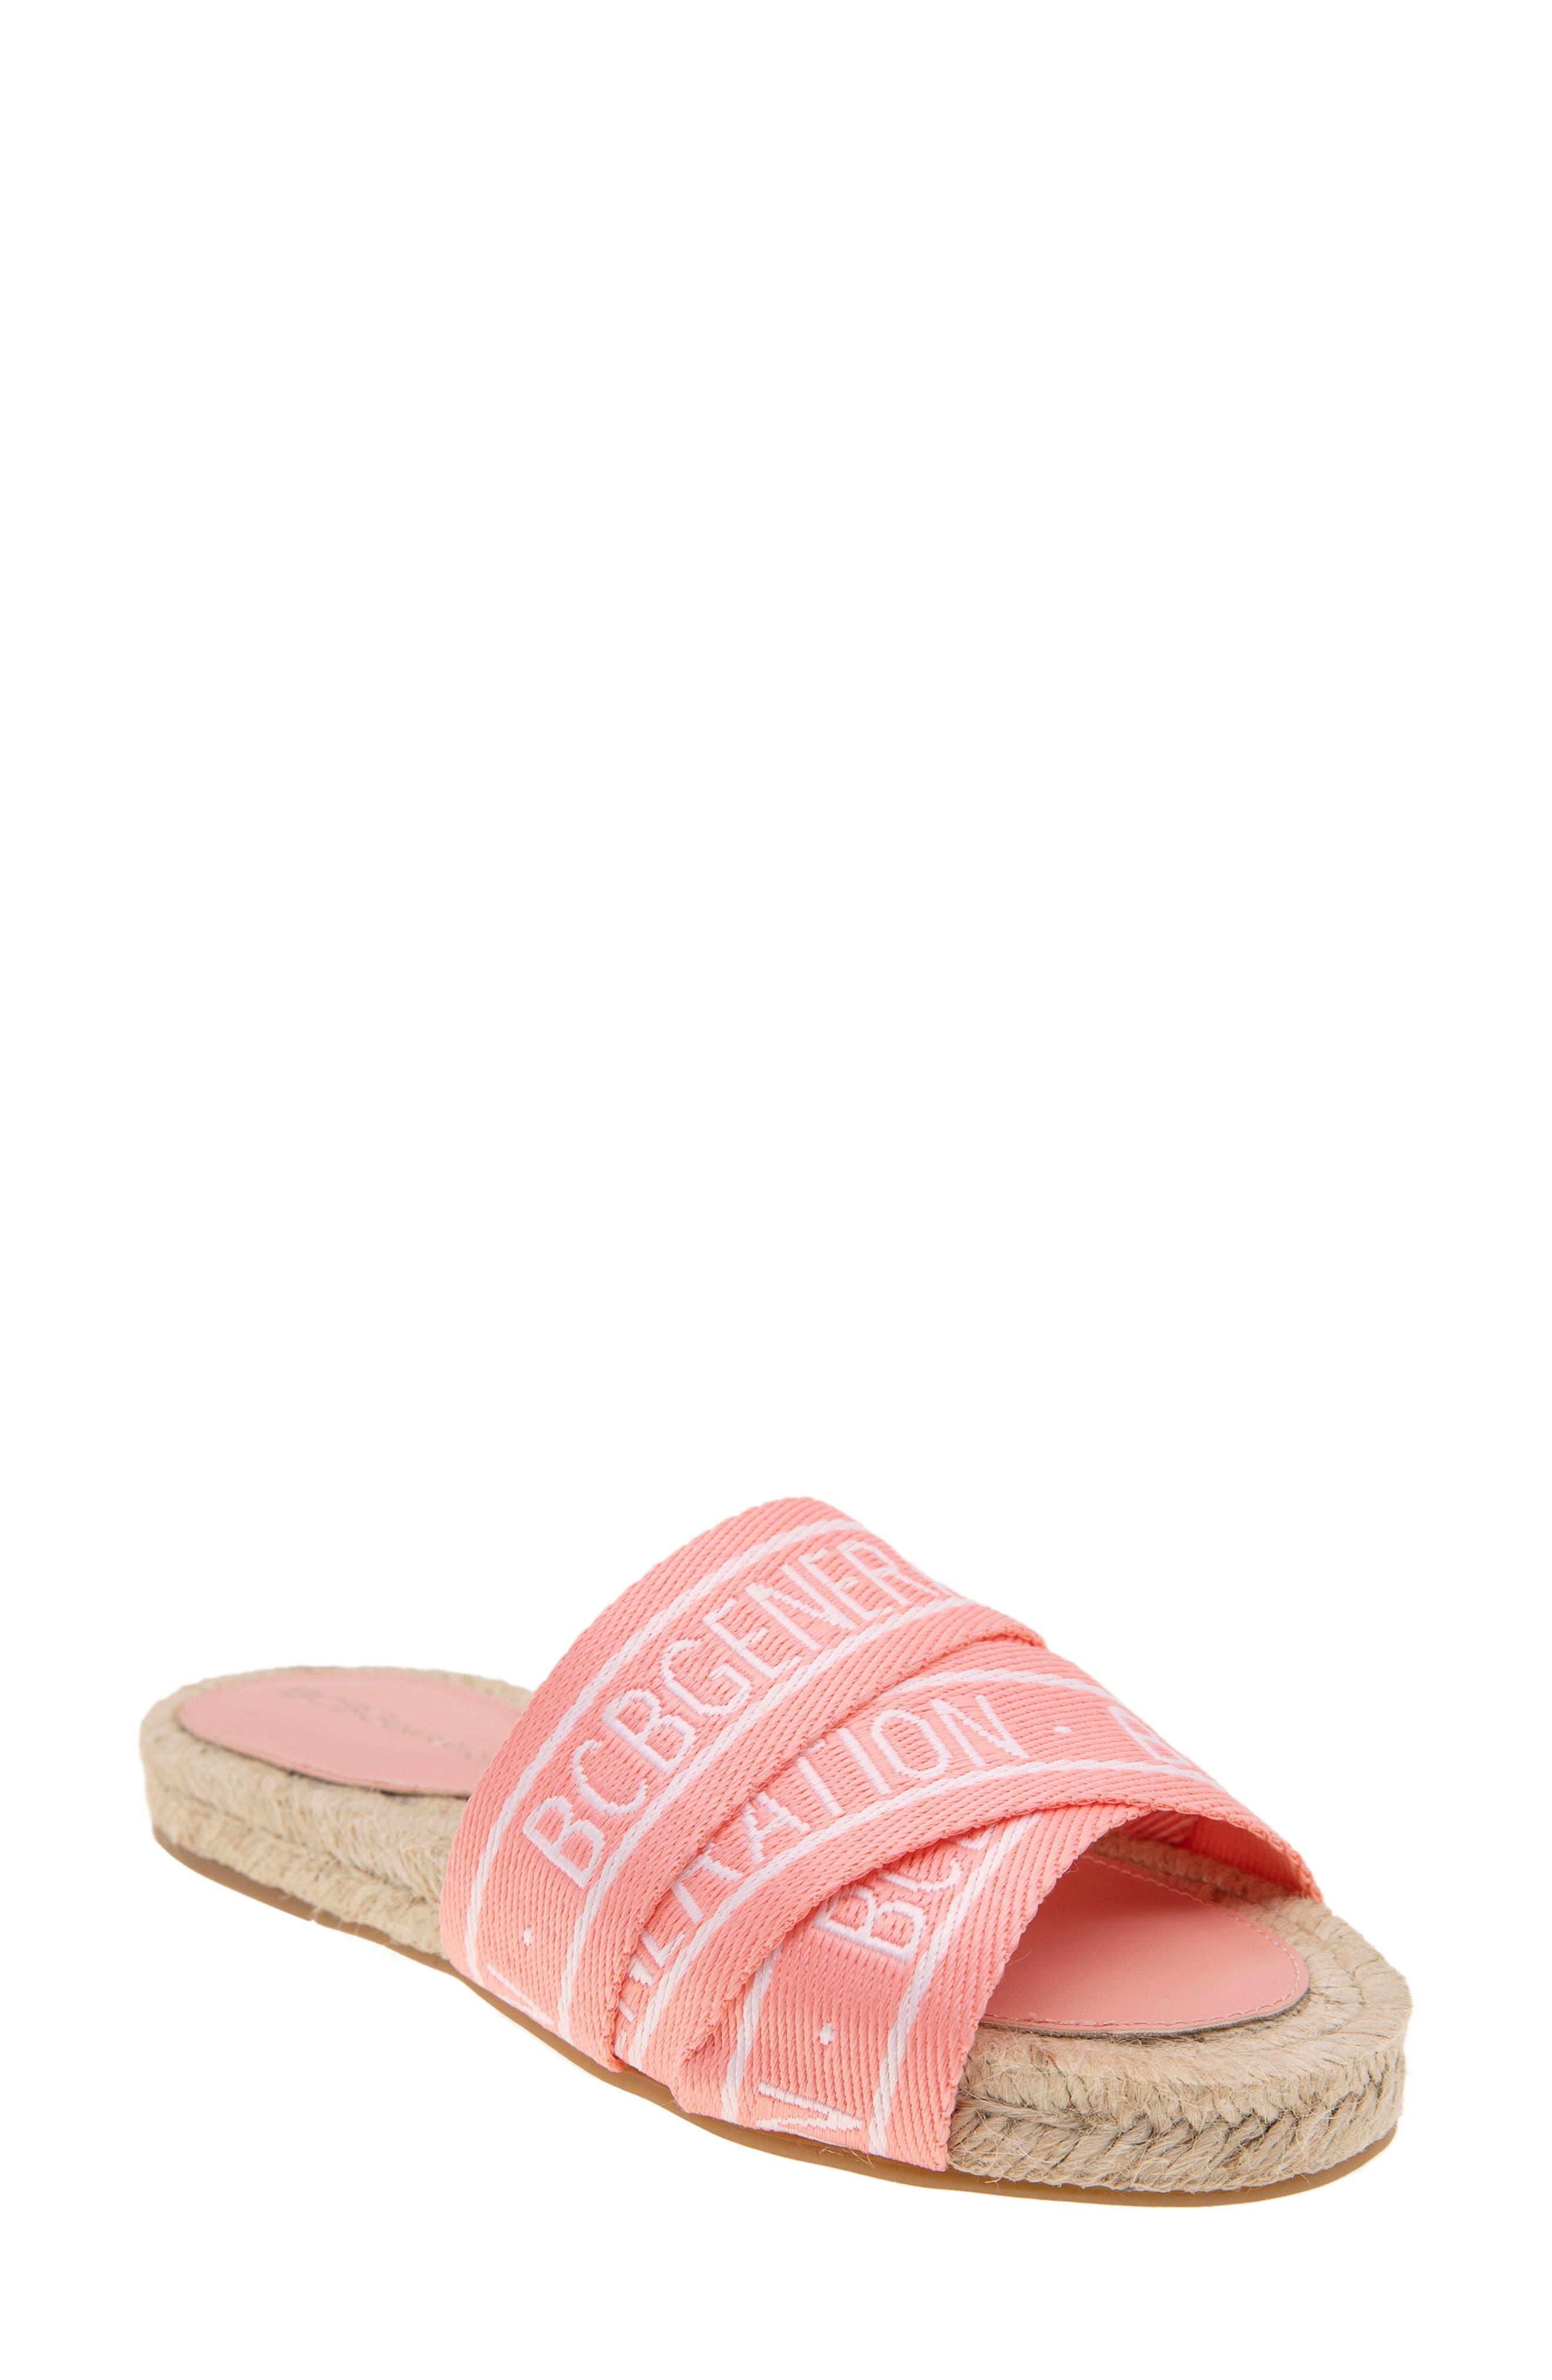 Bcbgeneration Sandals MAYA SANDAL